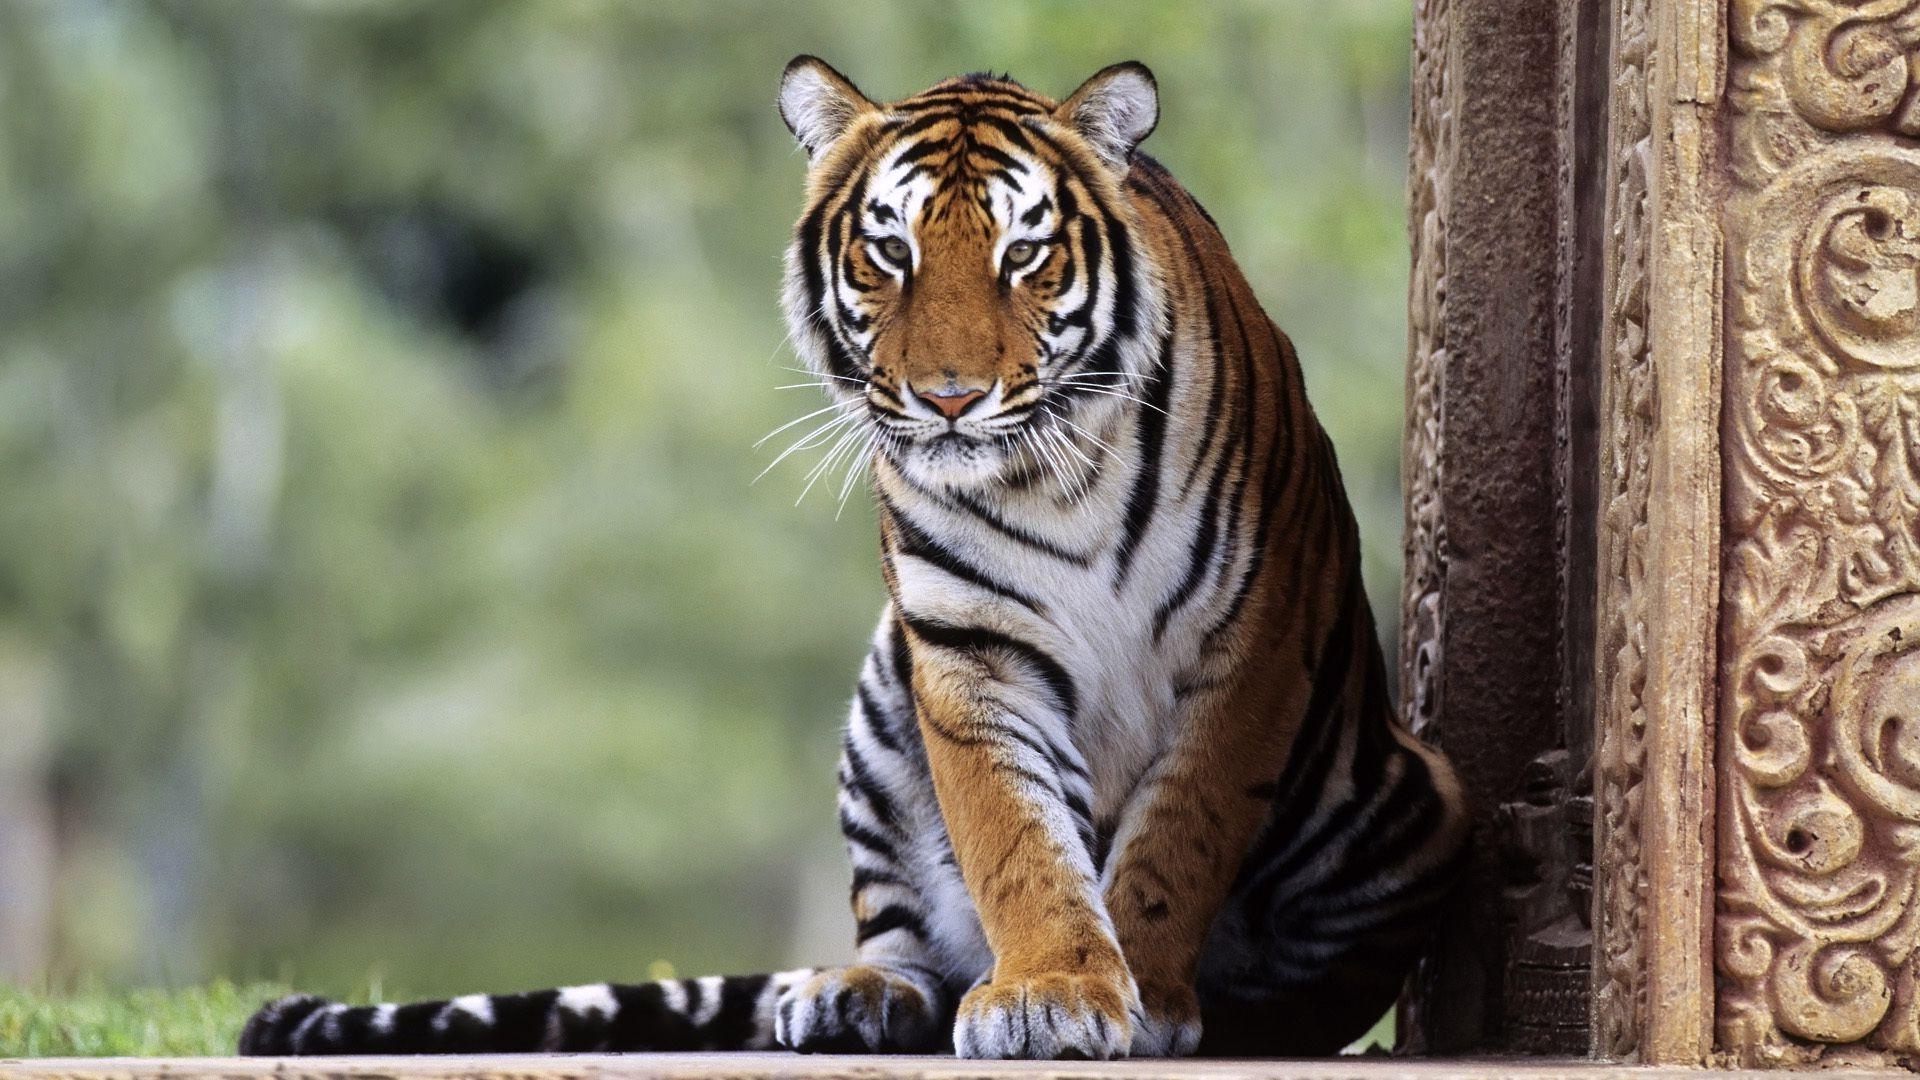 Wallpaper Animals Nature Tiger Wildlife Big Cats Zoo